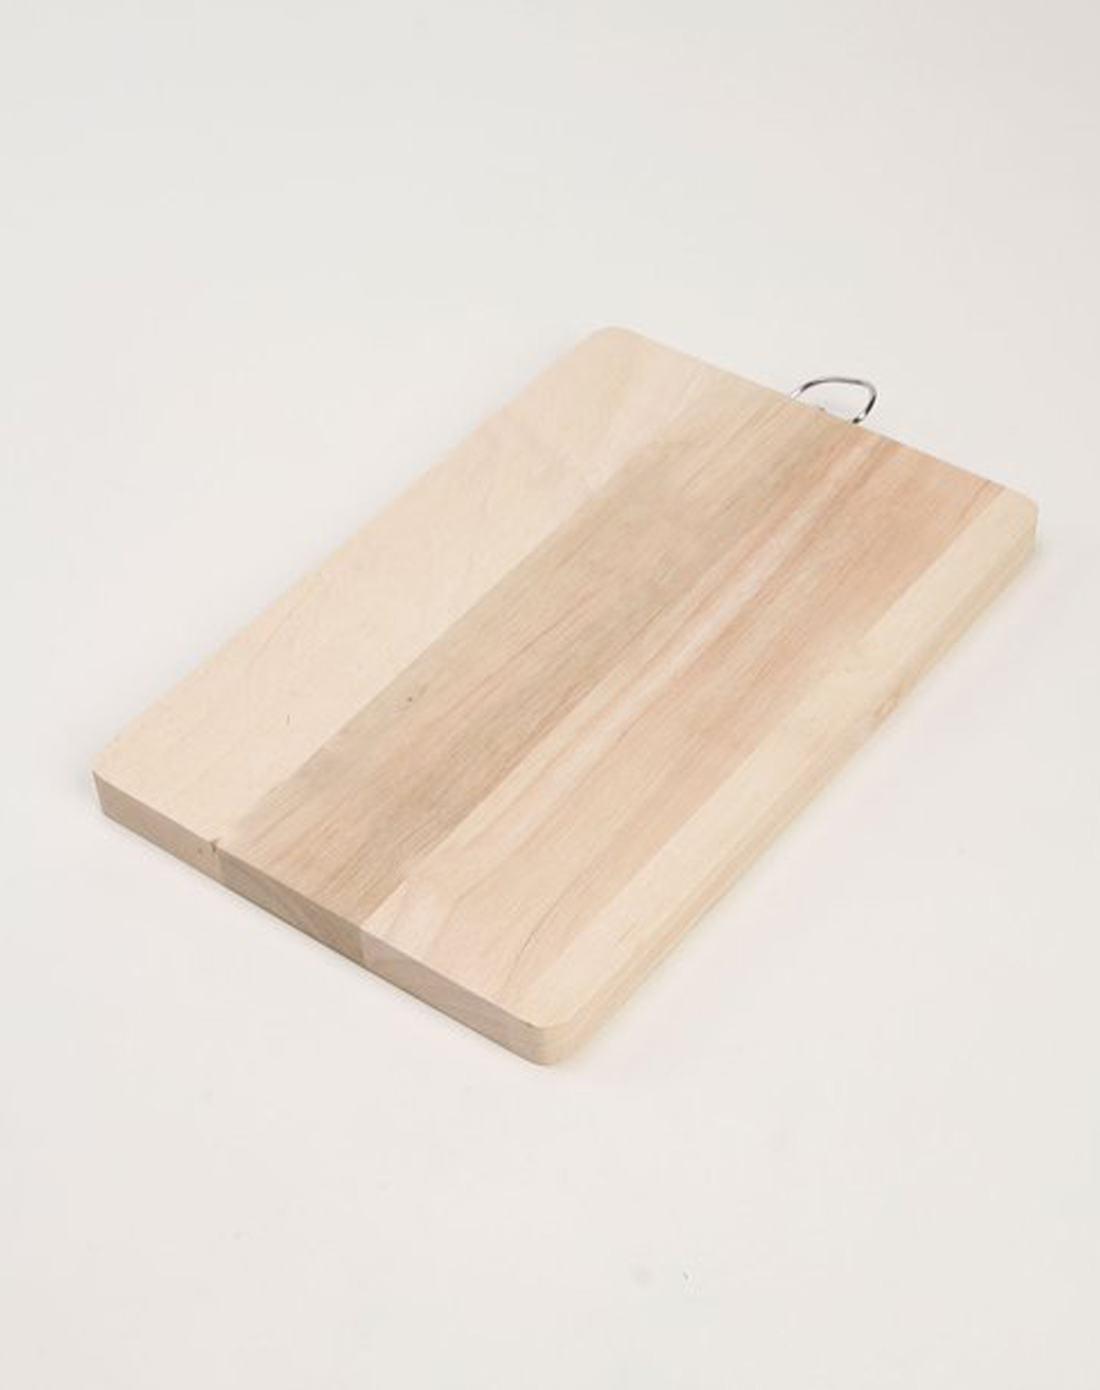 jm家居用品专场进口橡木原木长砧板(小)bh-3542